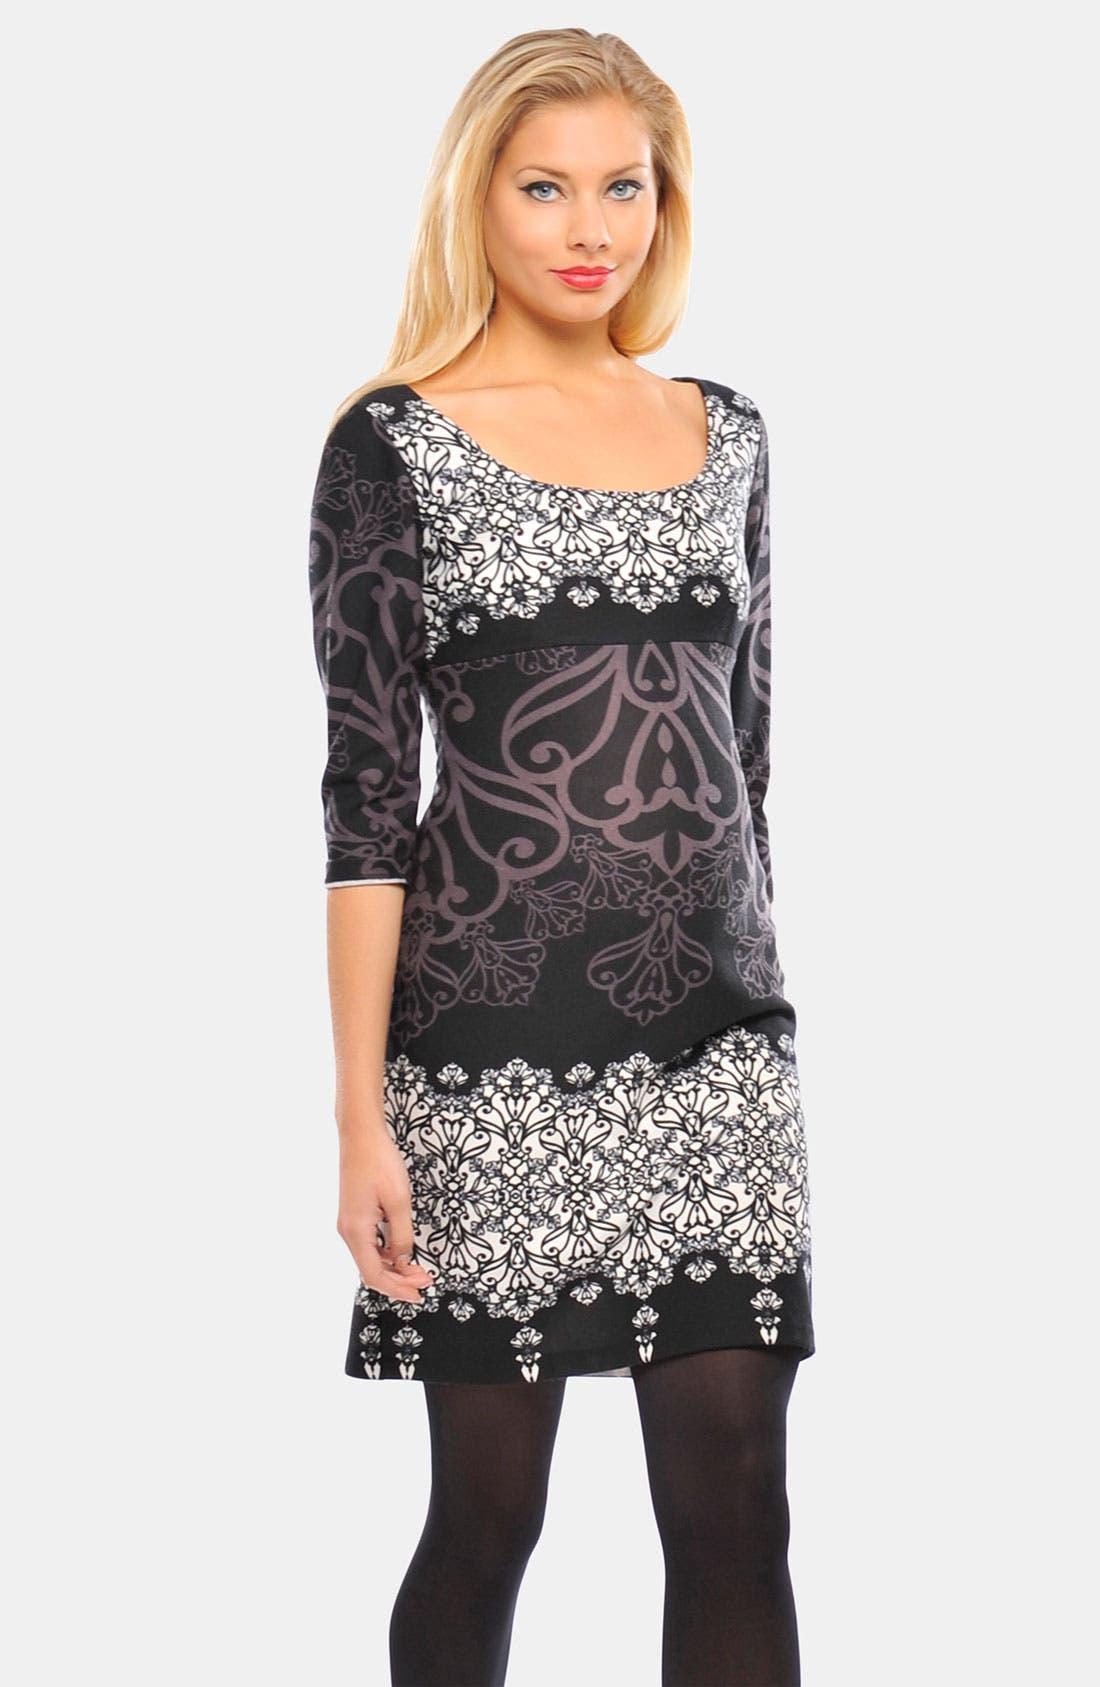 Alternate Image 1 Selected - Olian 'Suzie' Ponte Maternity Dress